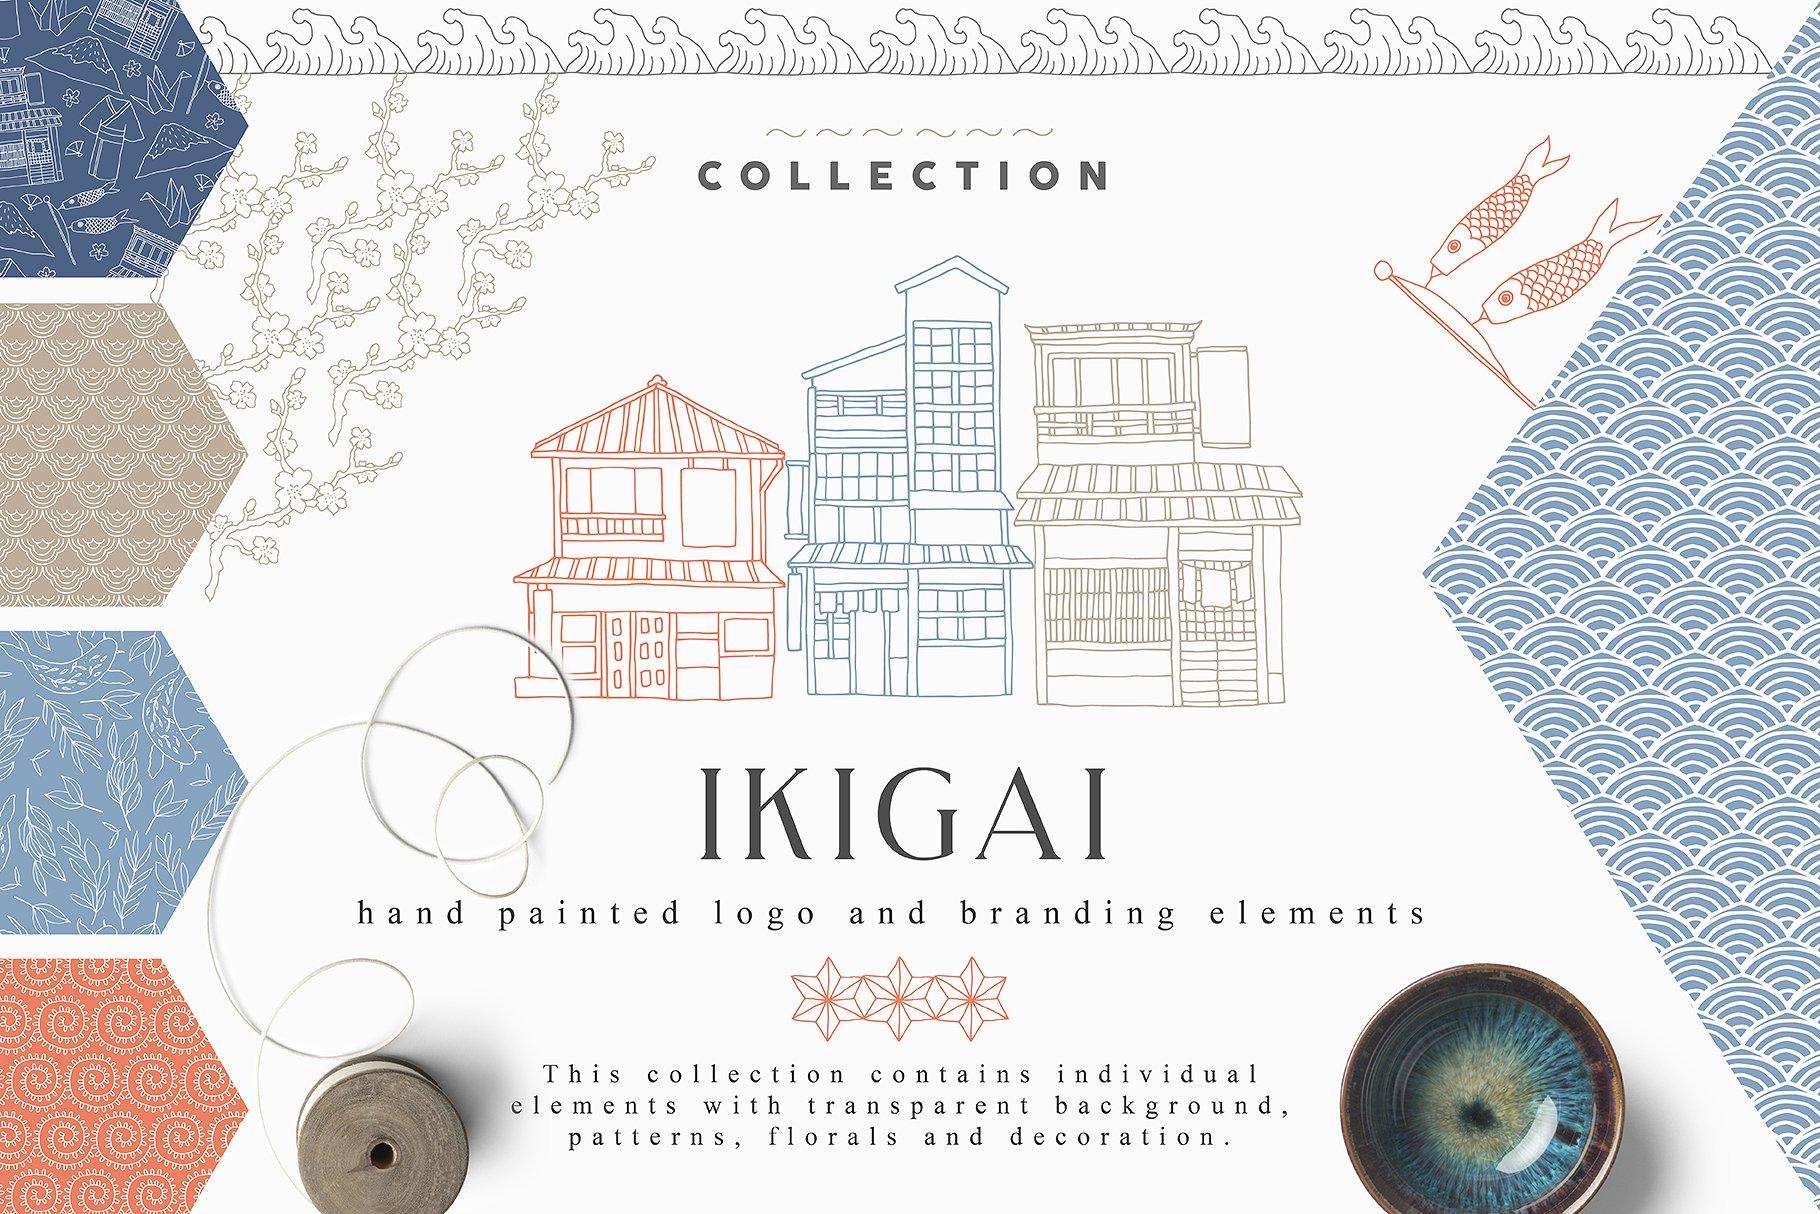 ikigai-main-image9-.jpg